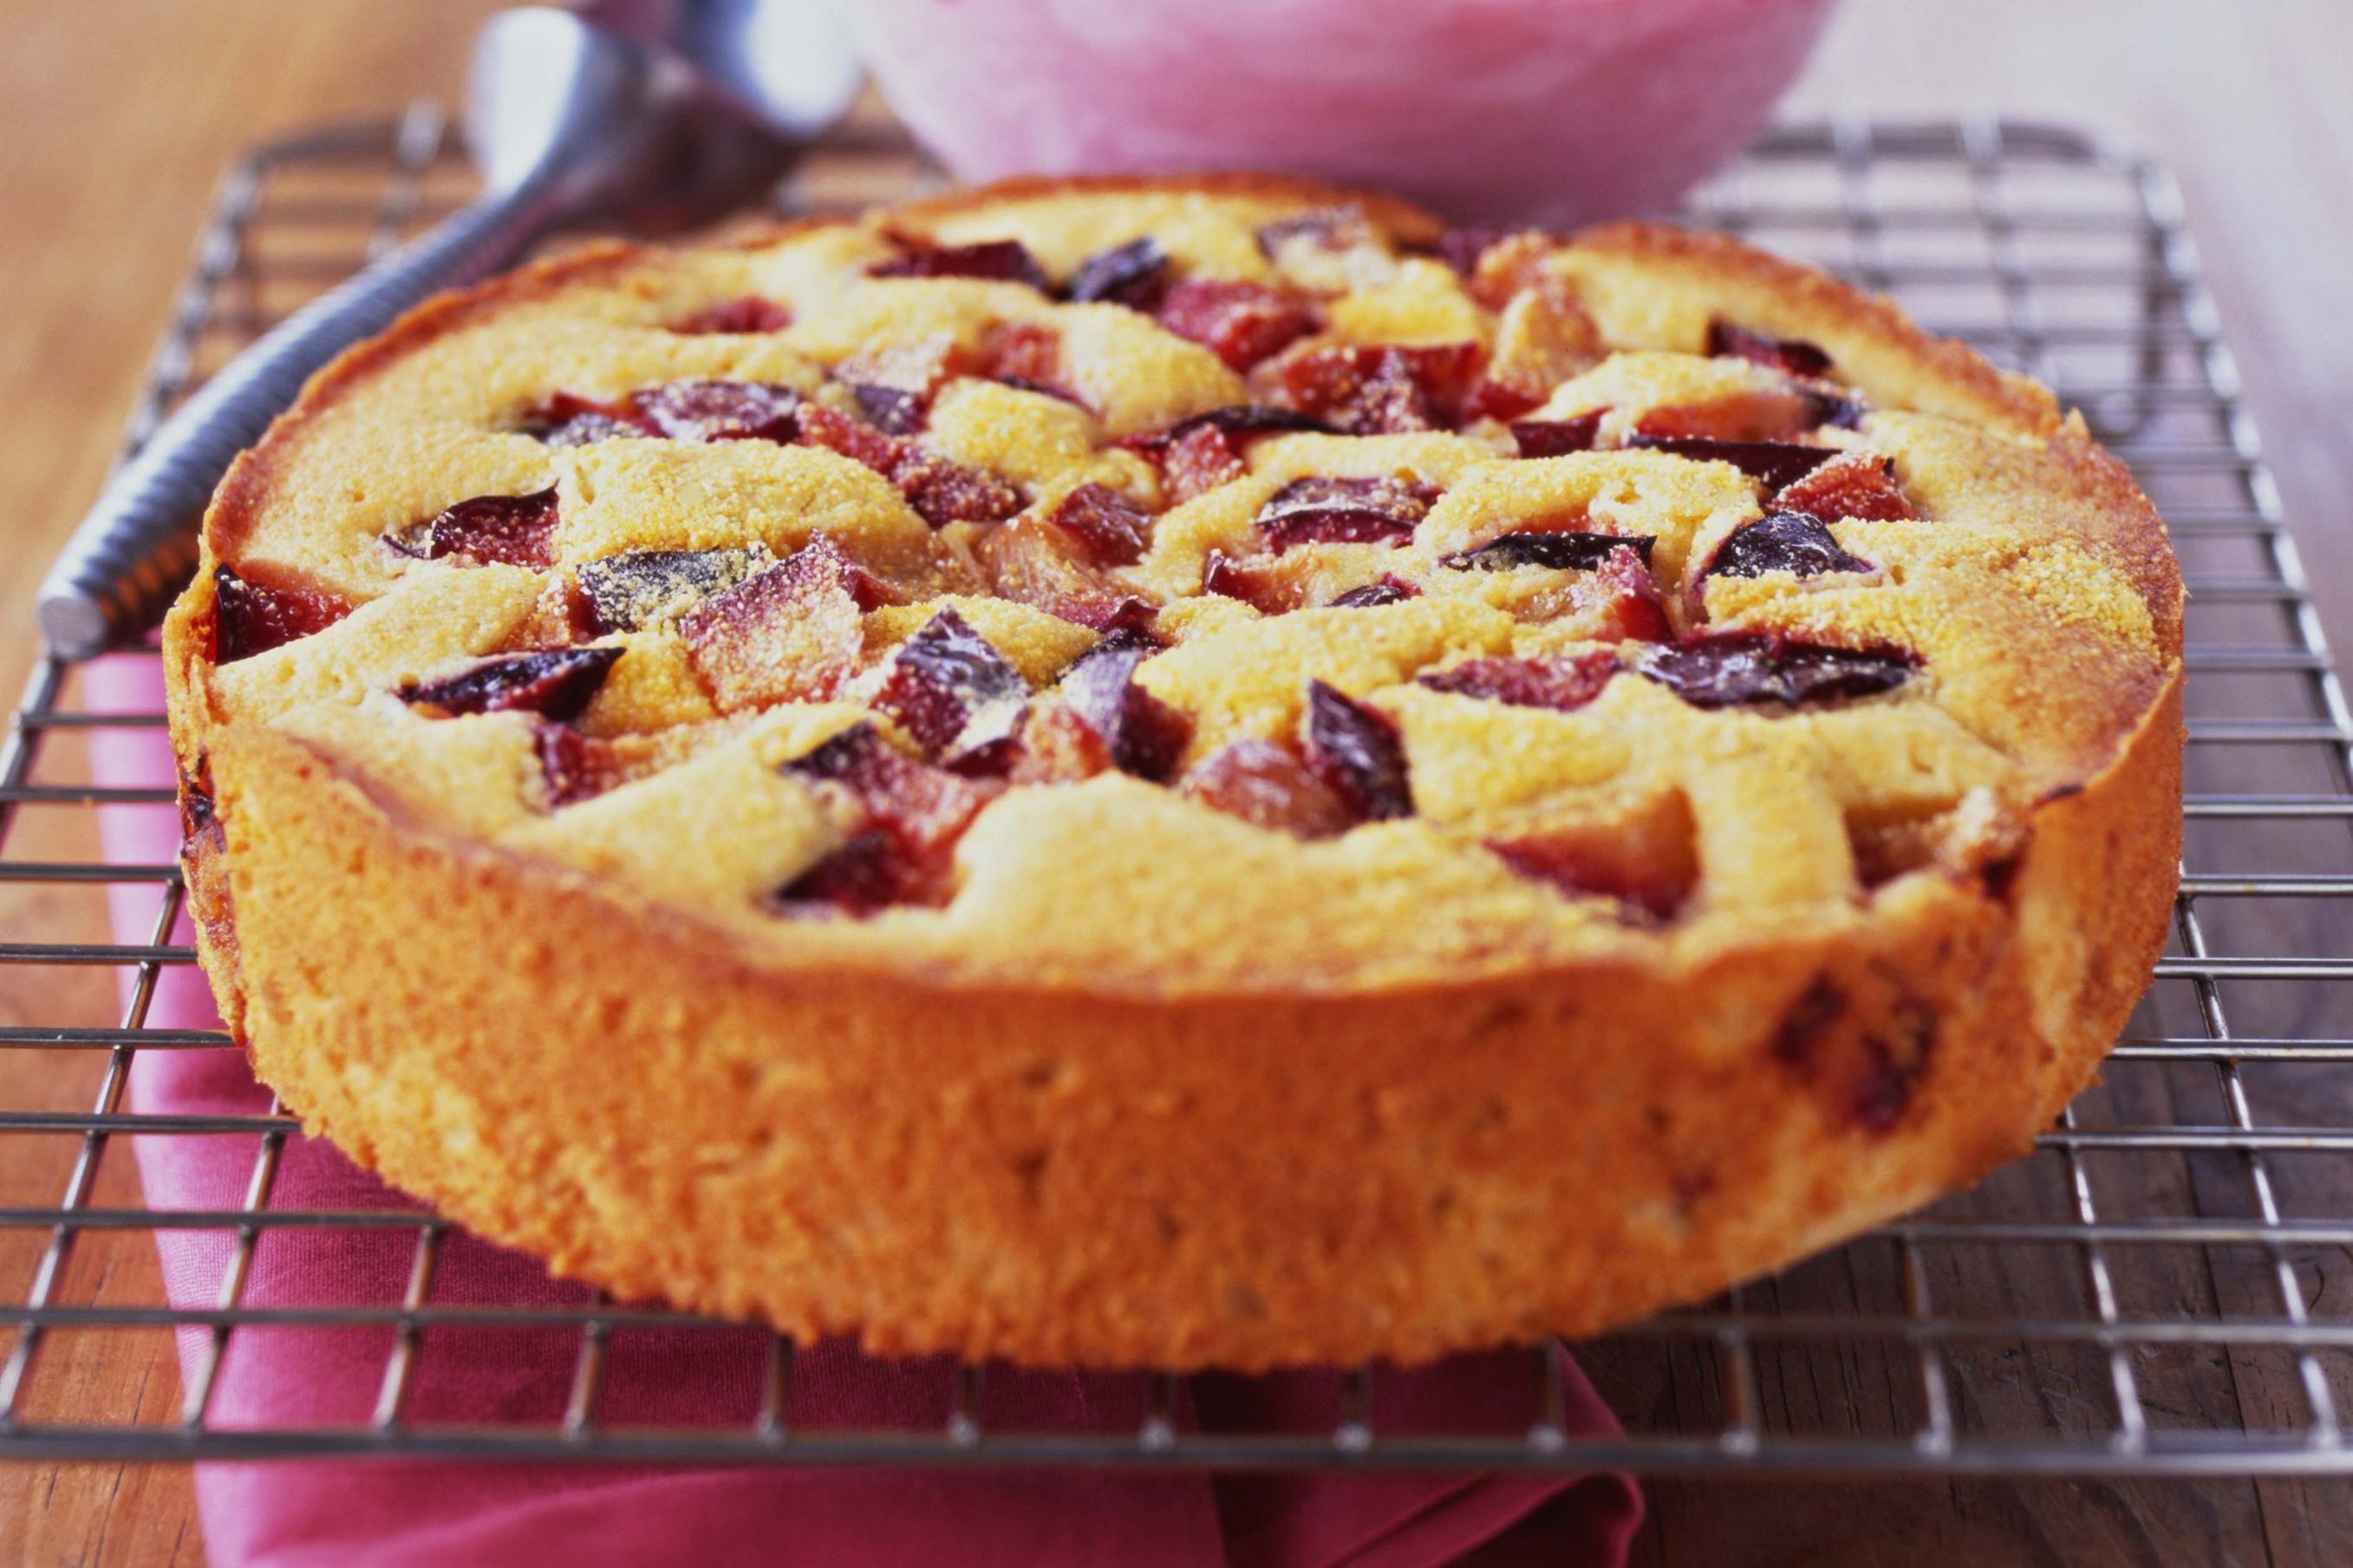 Polish plum cake placek z sliwkami recipe polish desserts food forumfinder Image collections